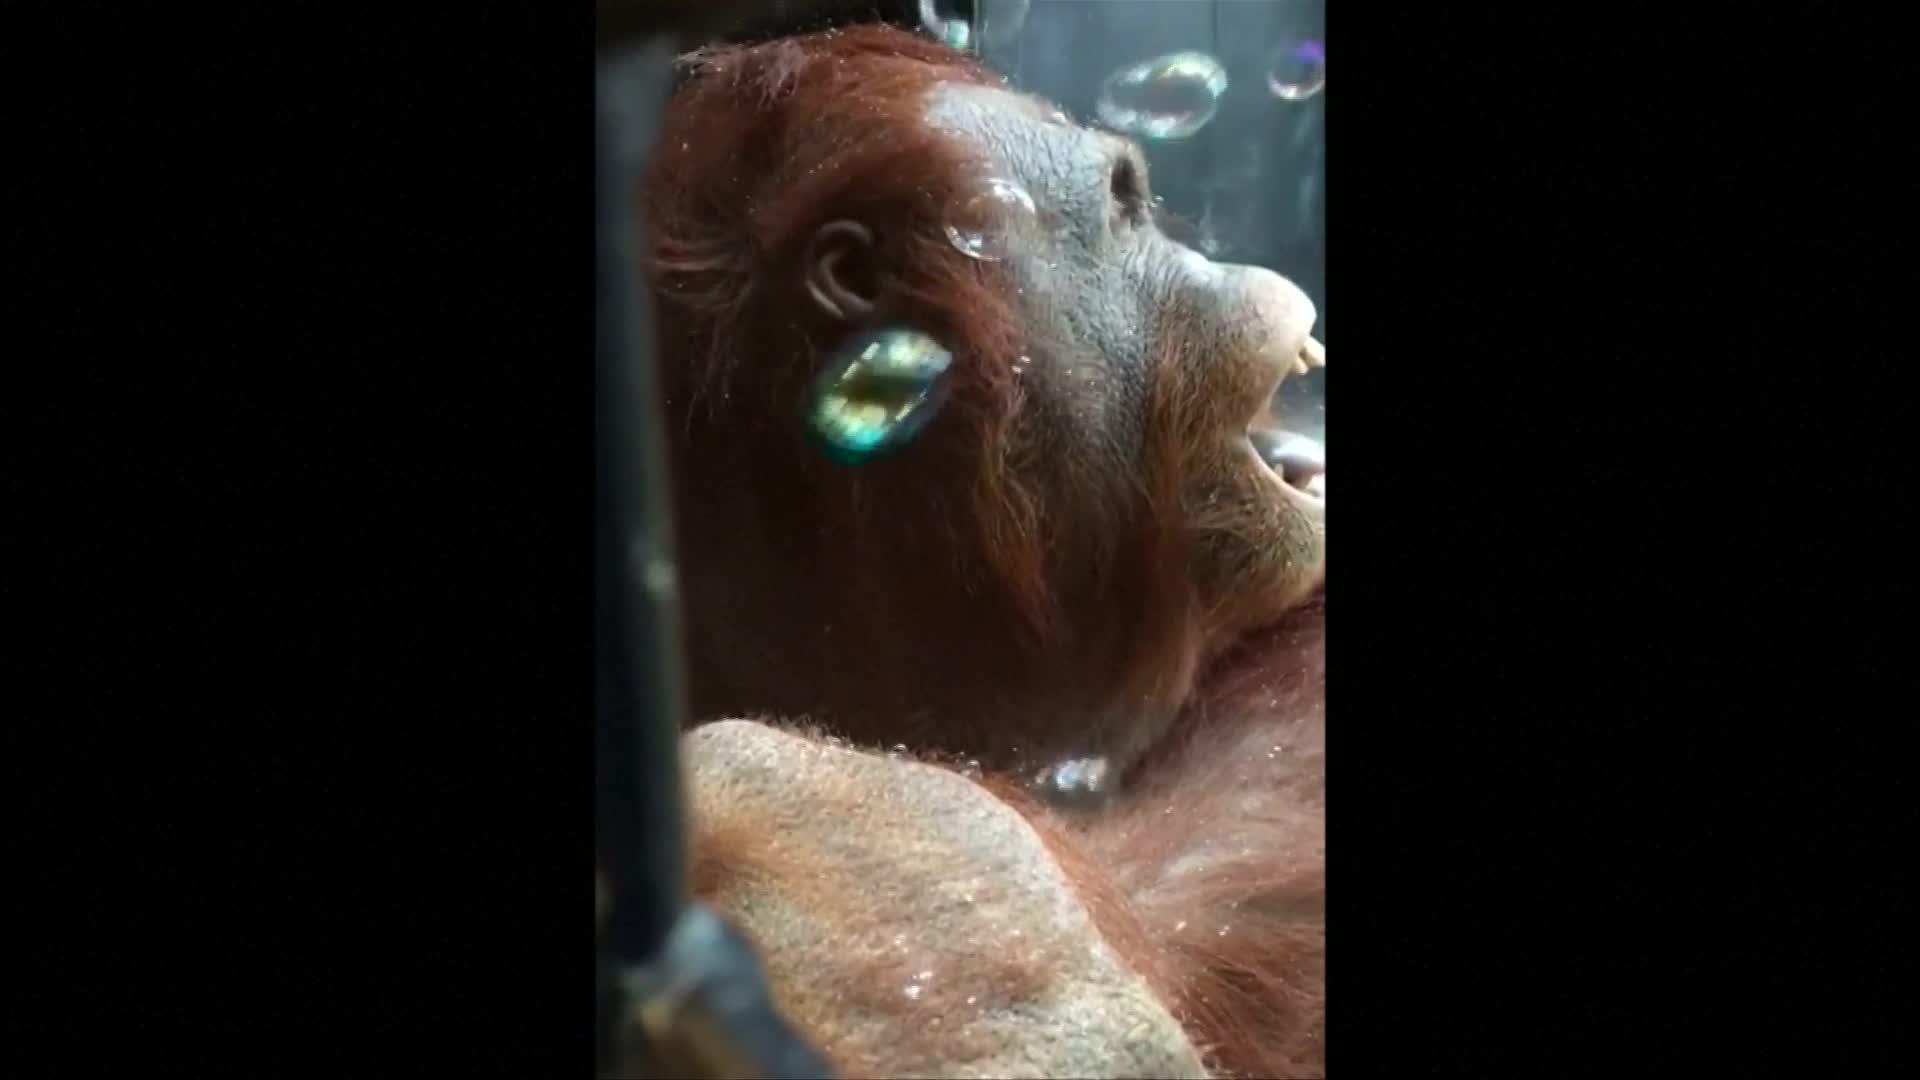 Orangutan monkeys around with bubbles at playtime